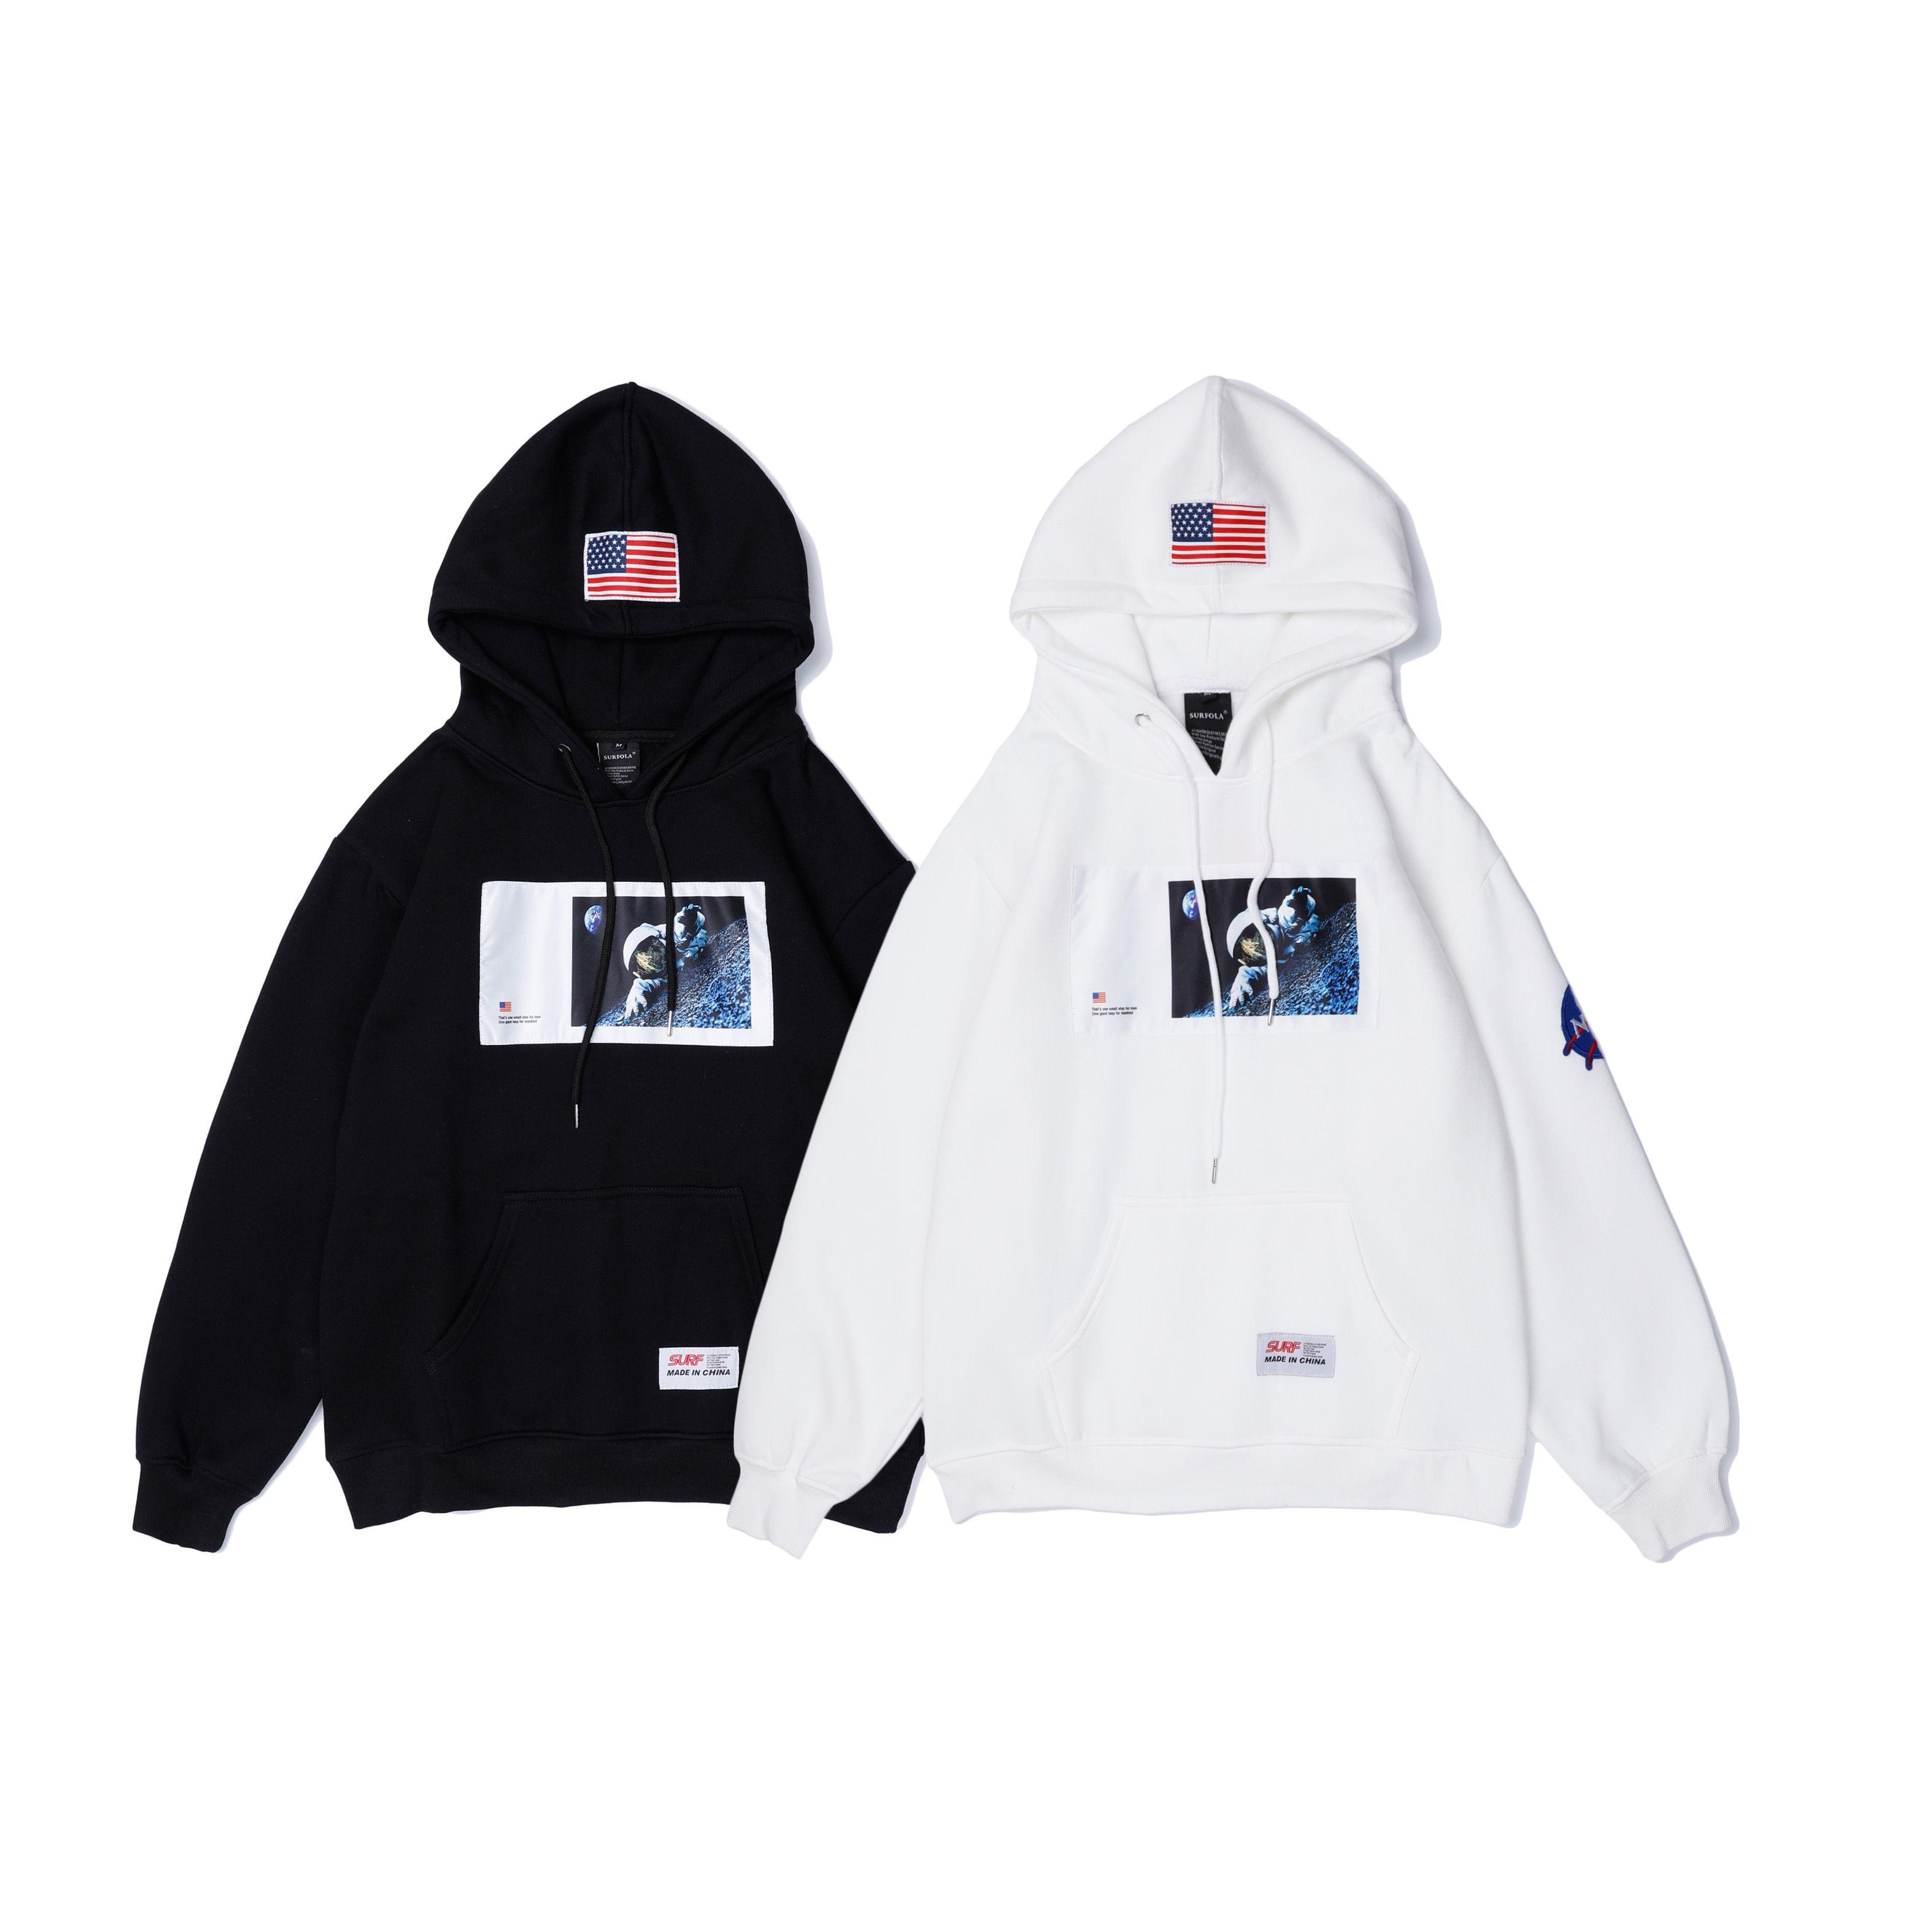 Hoodiea 남성 여성 디자이너 후드 긴 소매 운동복 2 색 패션 스트리트 커플 아시아 크기 M-2XL 옷